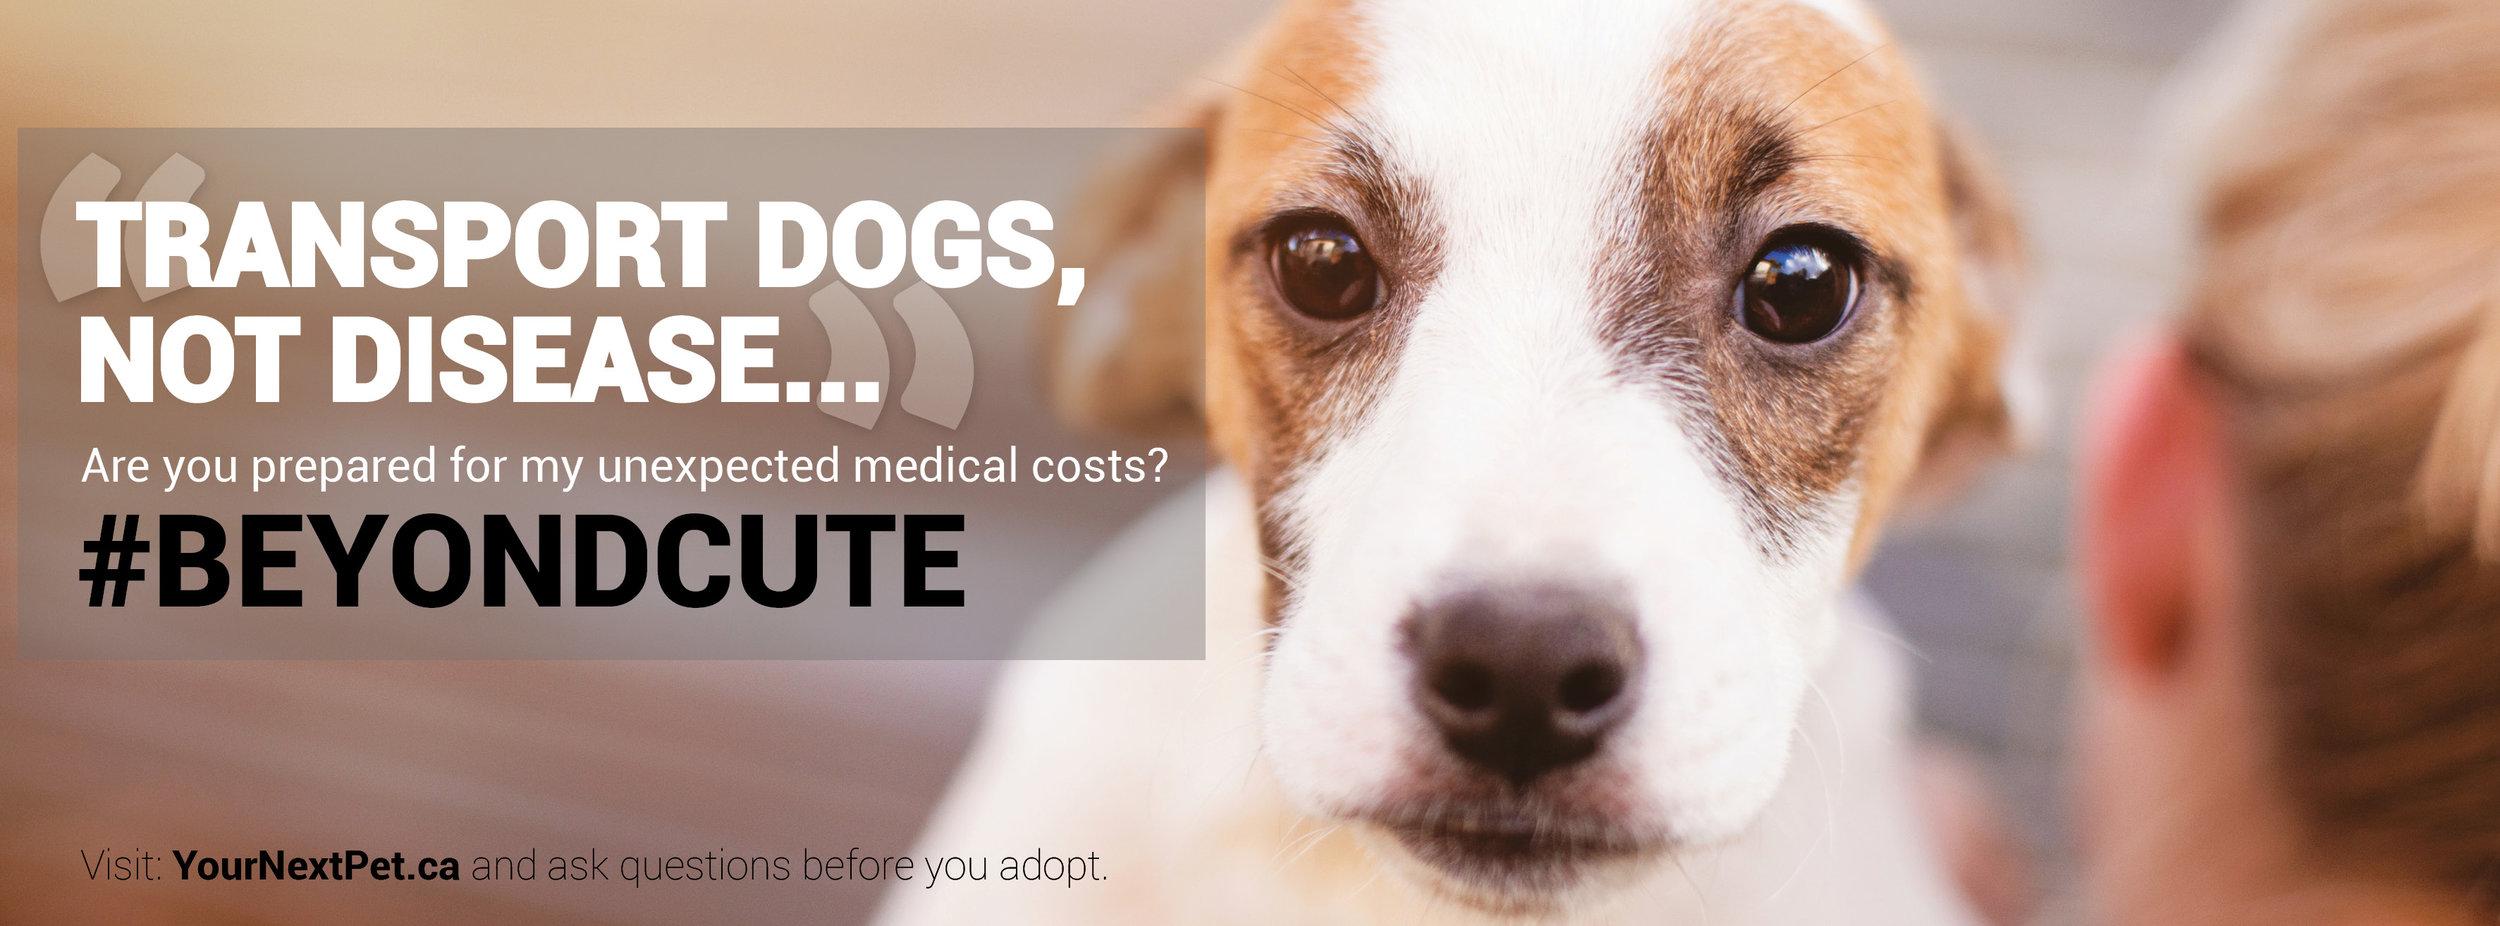 #BeyondCute Facebook Banner - BLOCKING Transport Dogs Not Disease - FINAL 2019.jpg